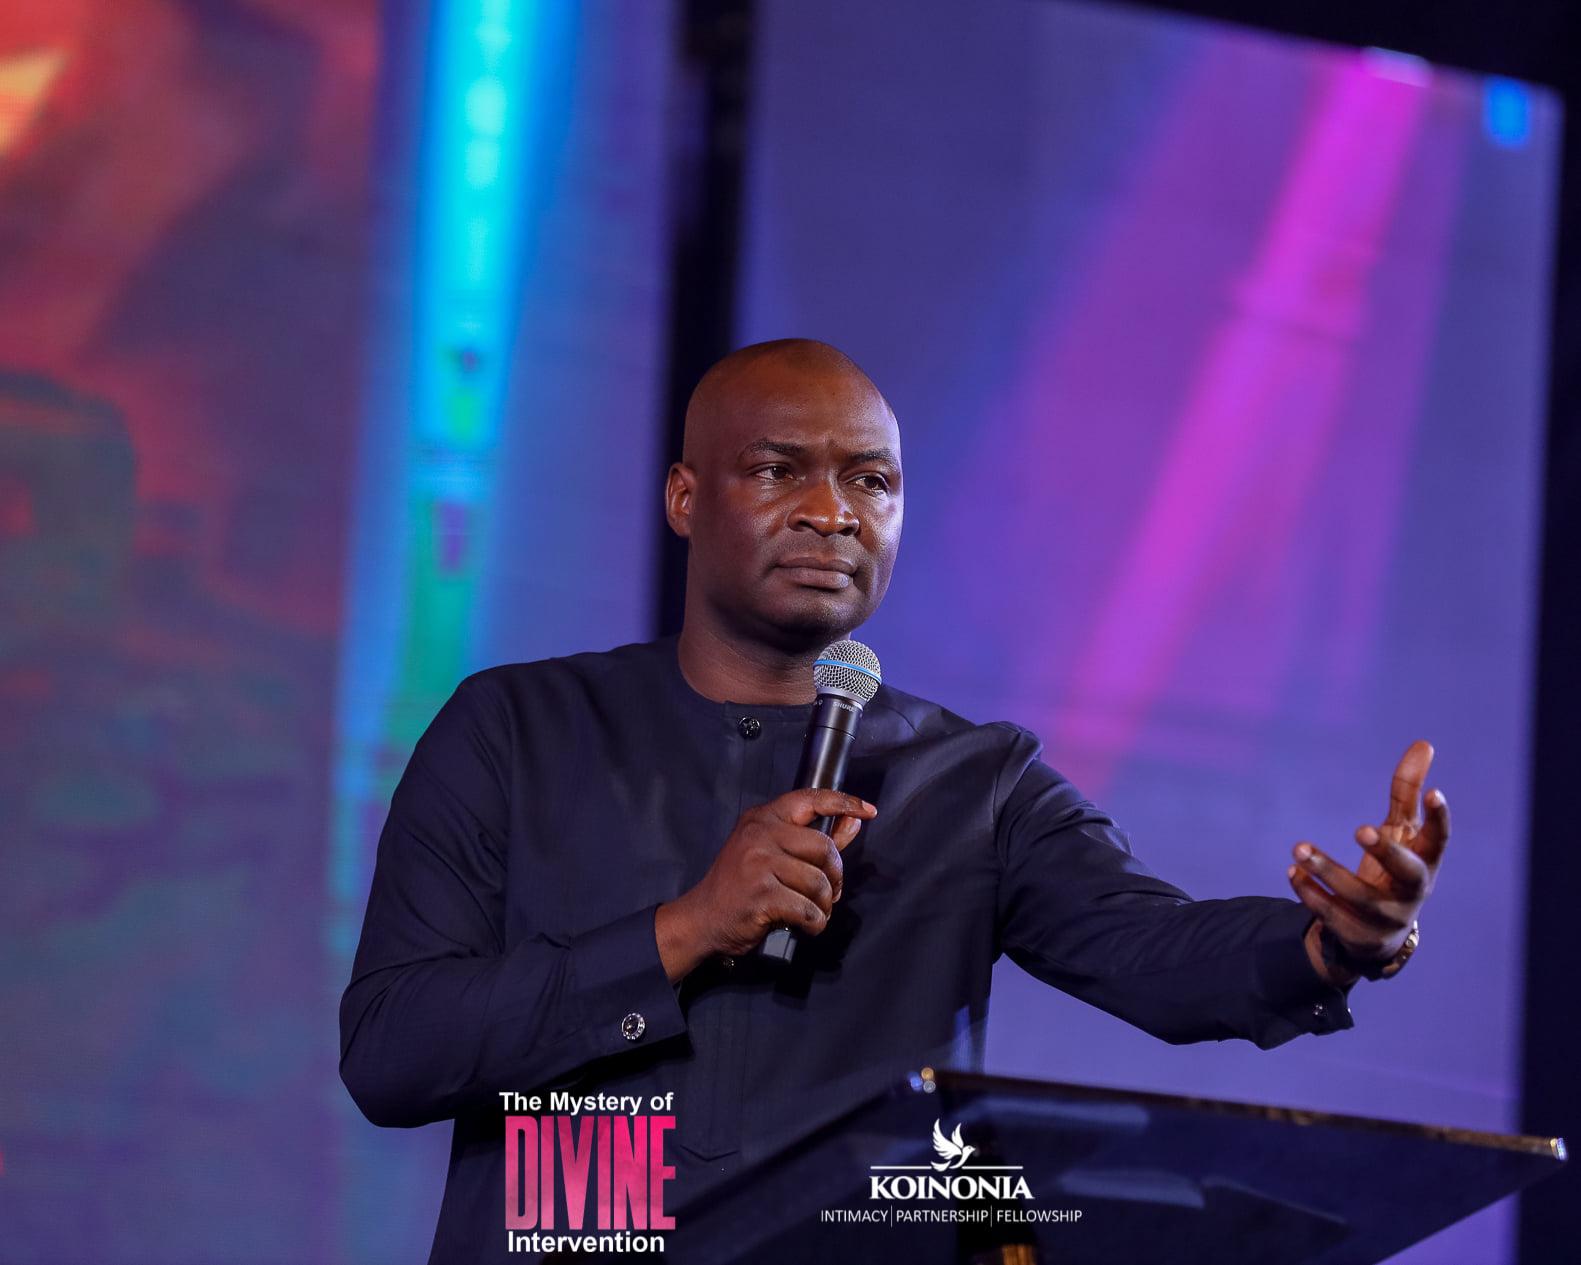 Download The Mystery of Divine Intervention Koinonia Abuja Sermon with Apostle Joshua Selman